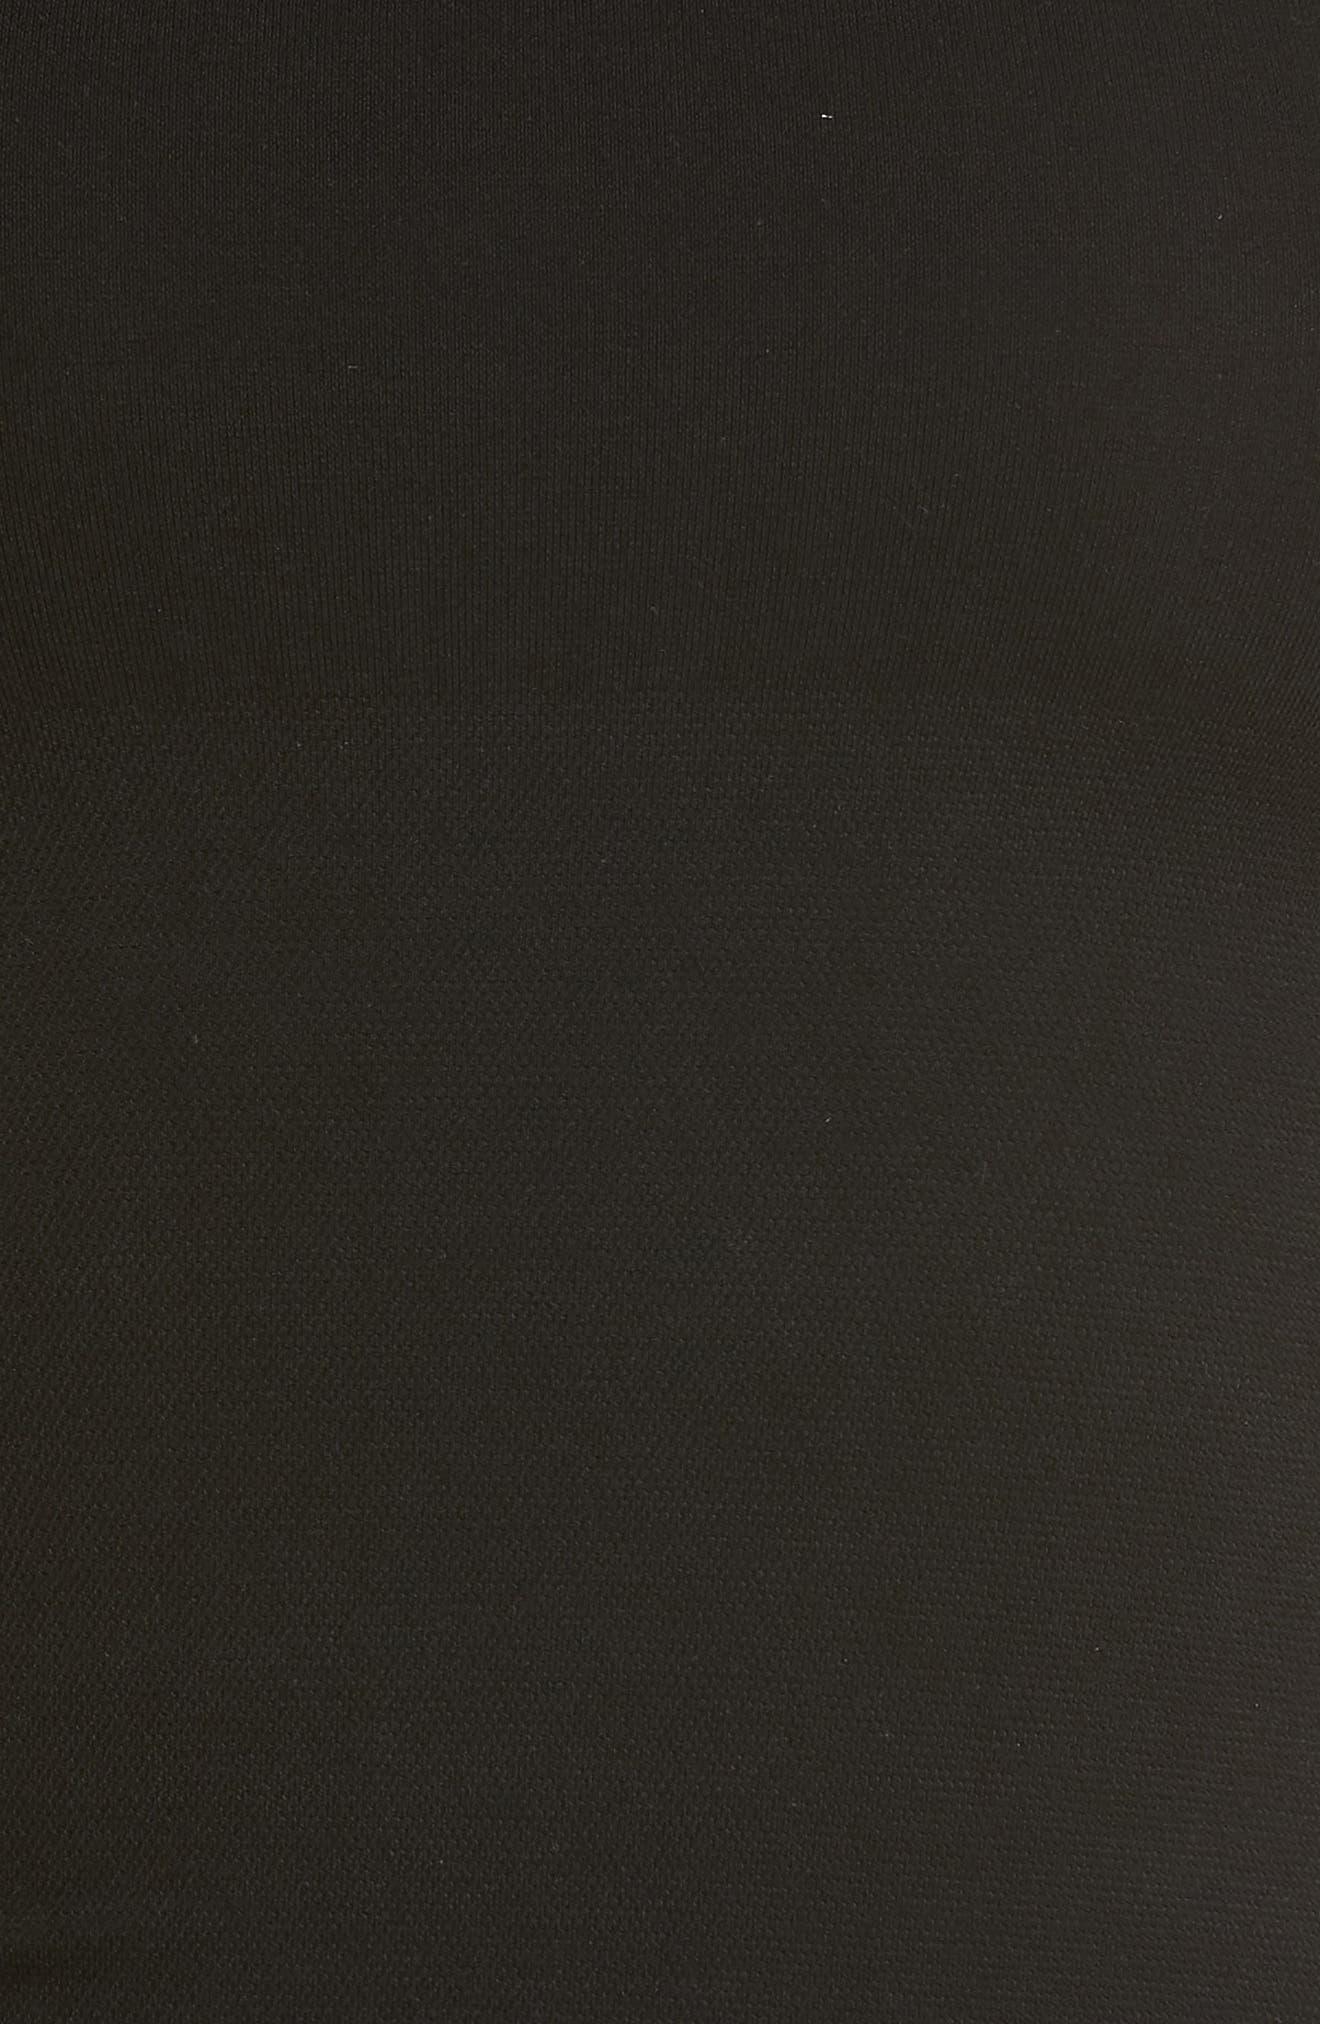 Scoop Neck Shaping Tank,                             Alternate thumbnail 5, color,                             BLACK